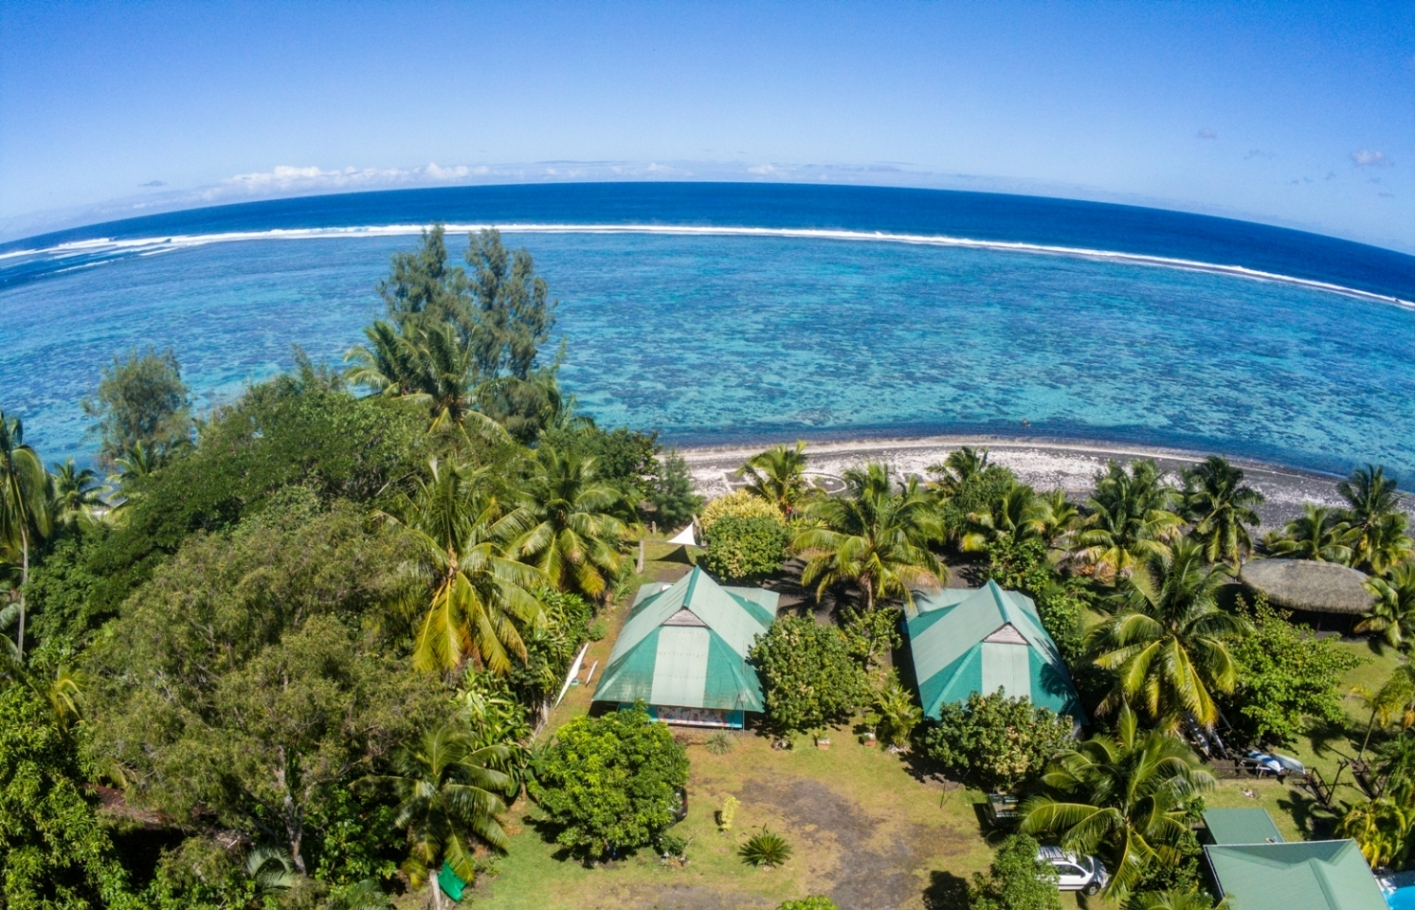 https://tahititourisme.nz/wp-content/uploads/2019/08/copie-Tahiti-tourisme-948ko.jpg